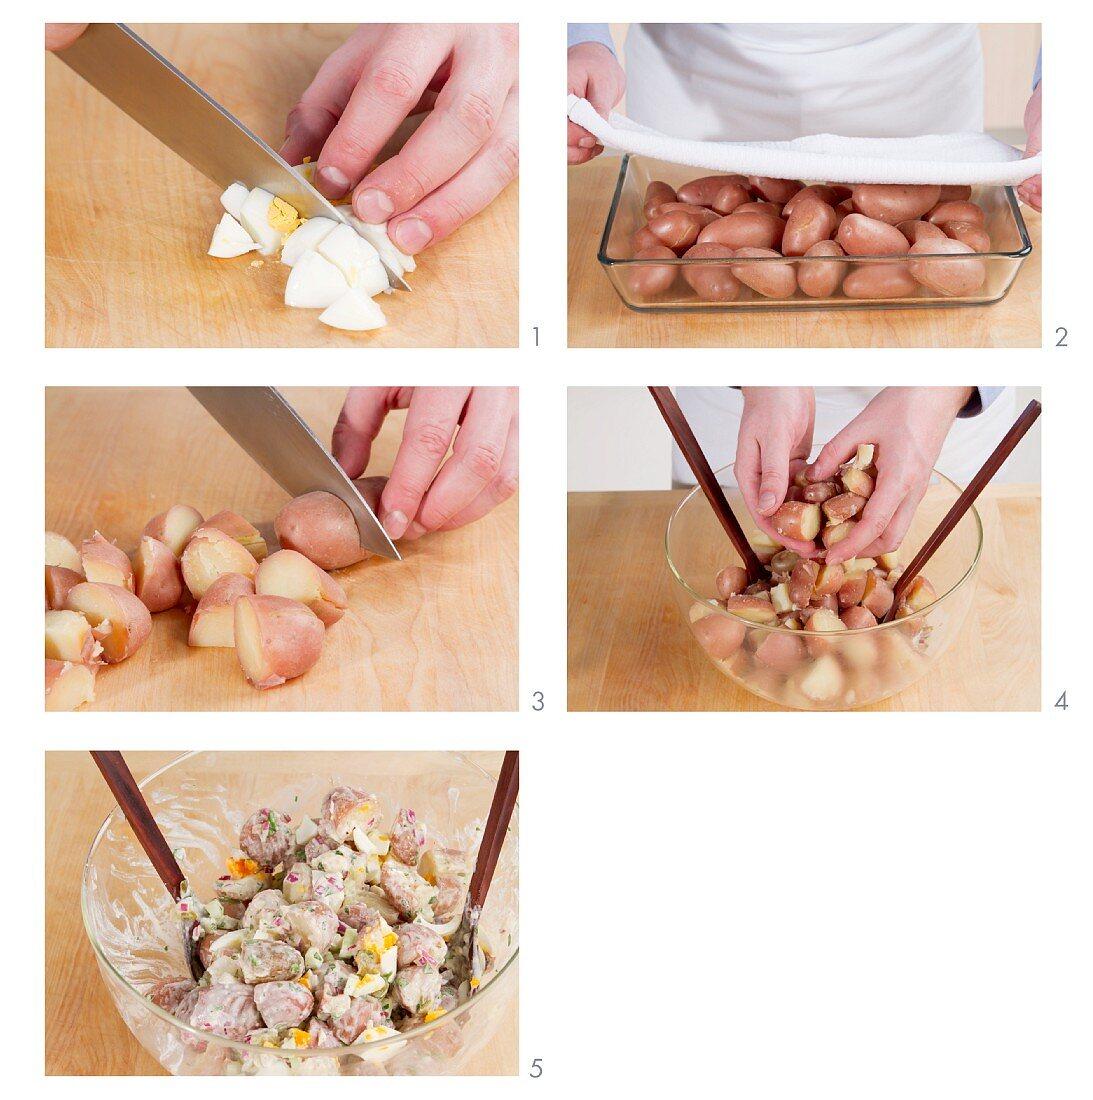 American potato salad being prepared